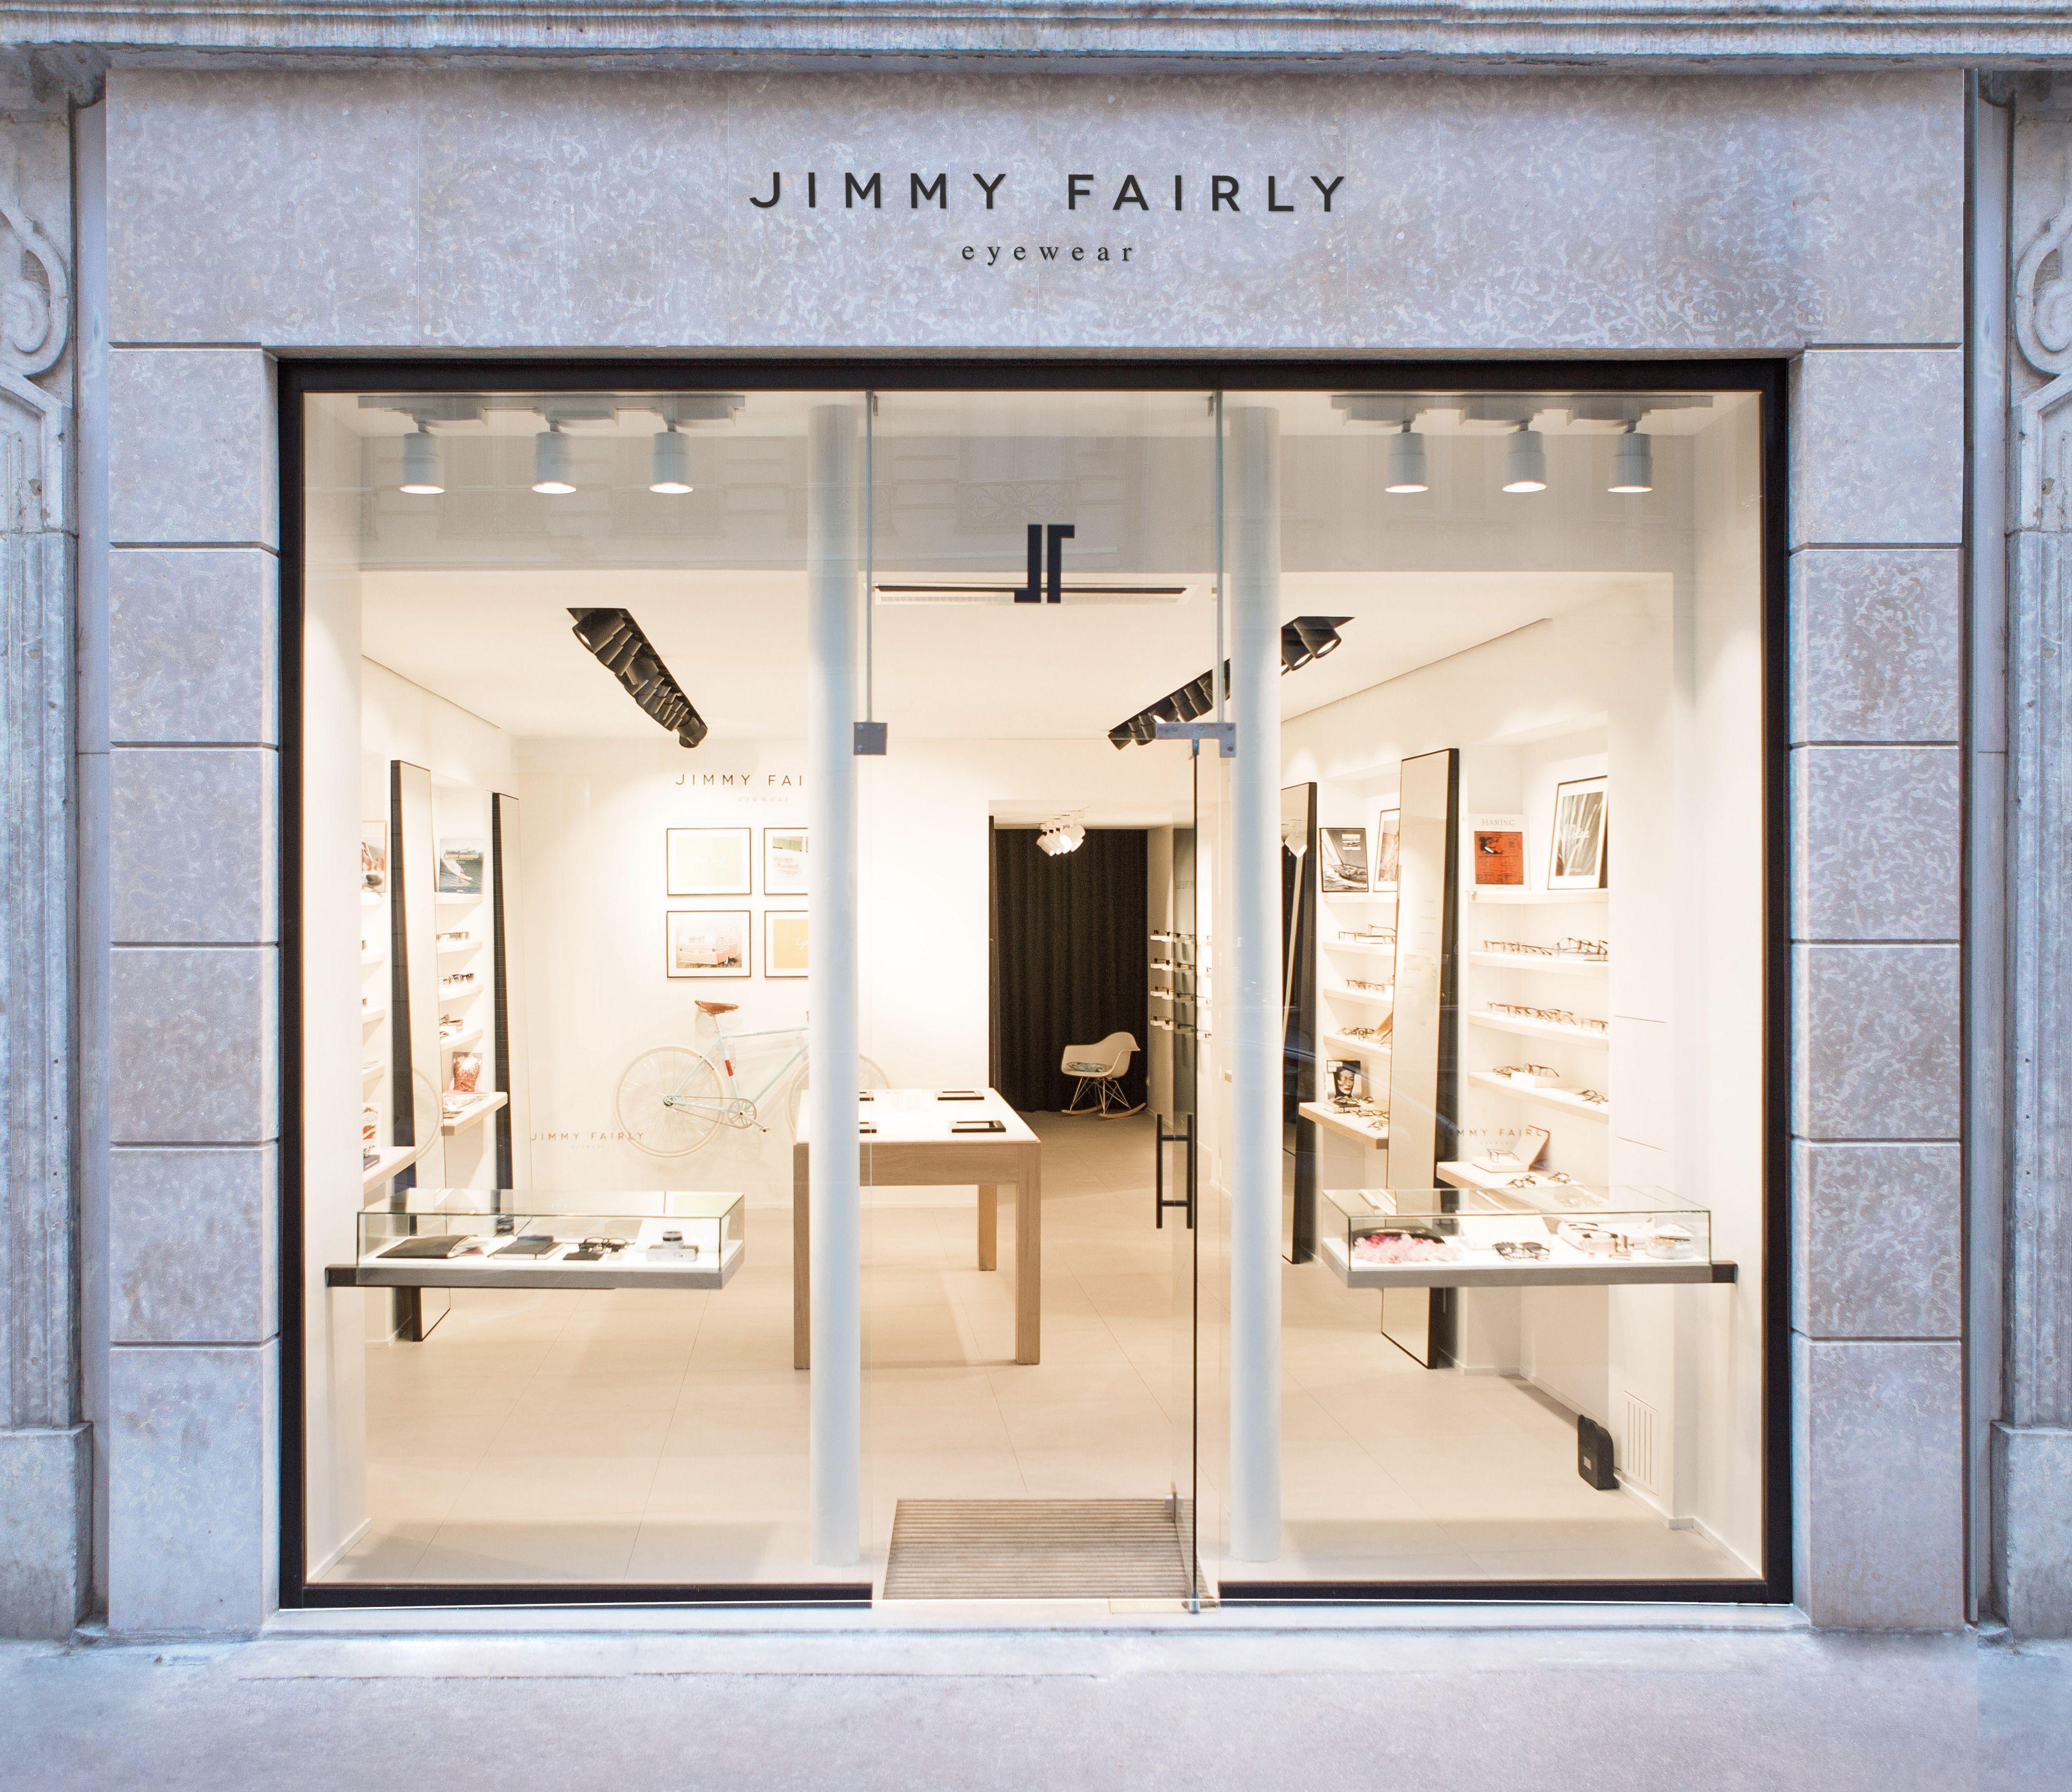 Jimmy Fairly Lyon Diseno Interior De Tienda Diseno De Mostrador Diseno De Fachada De Tienda